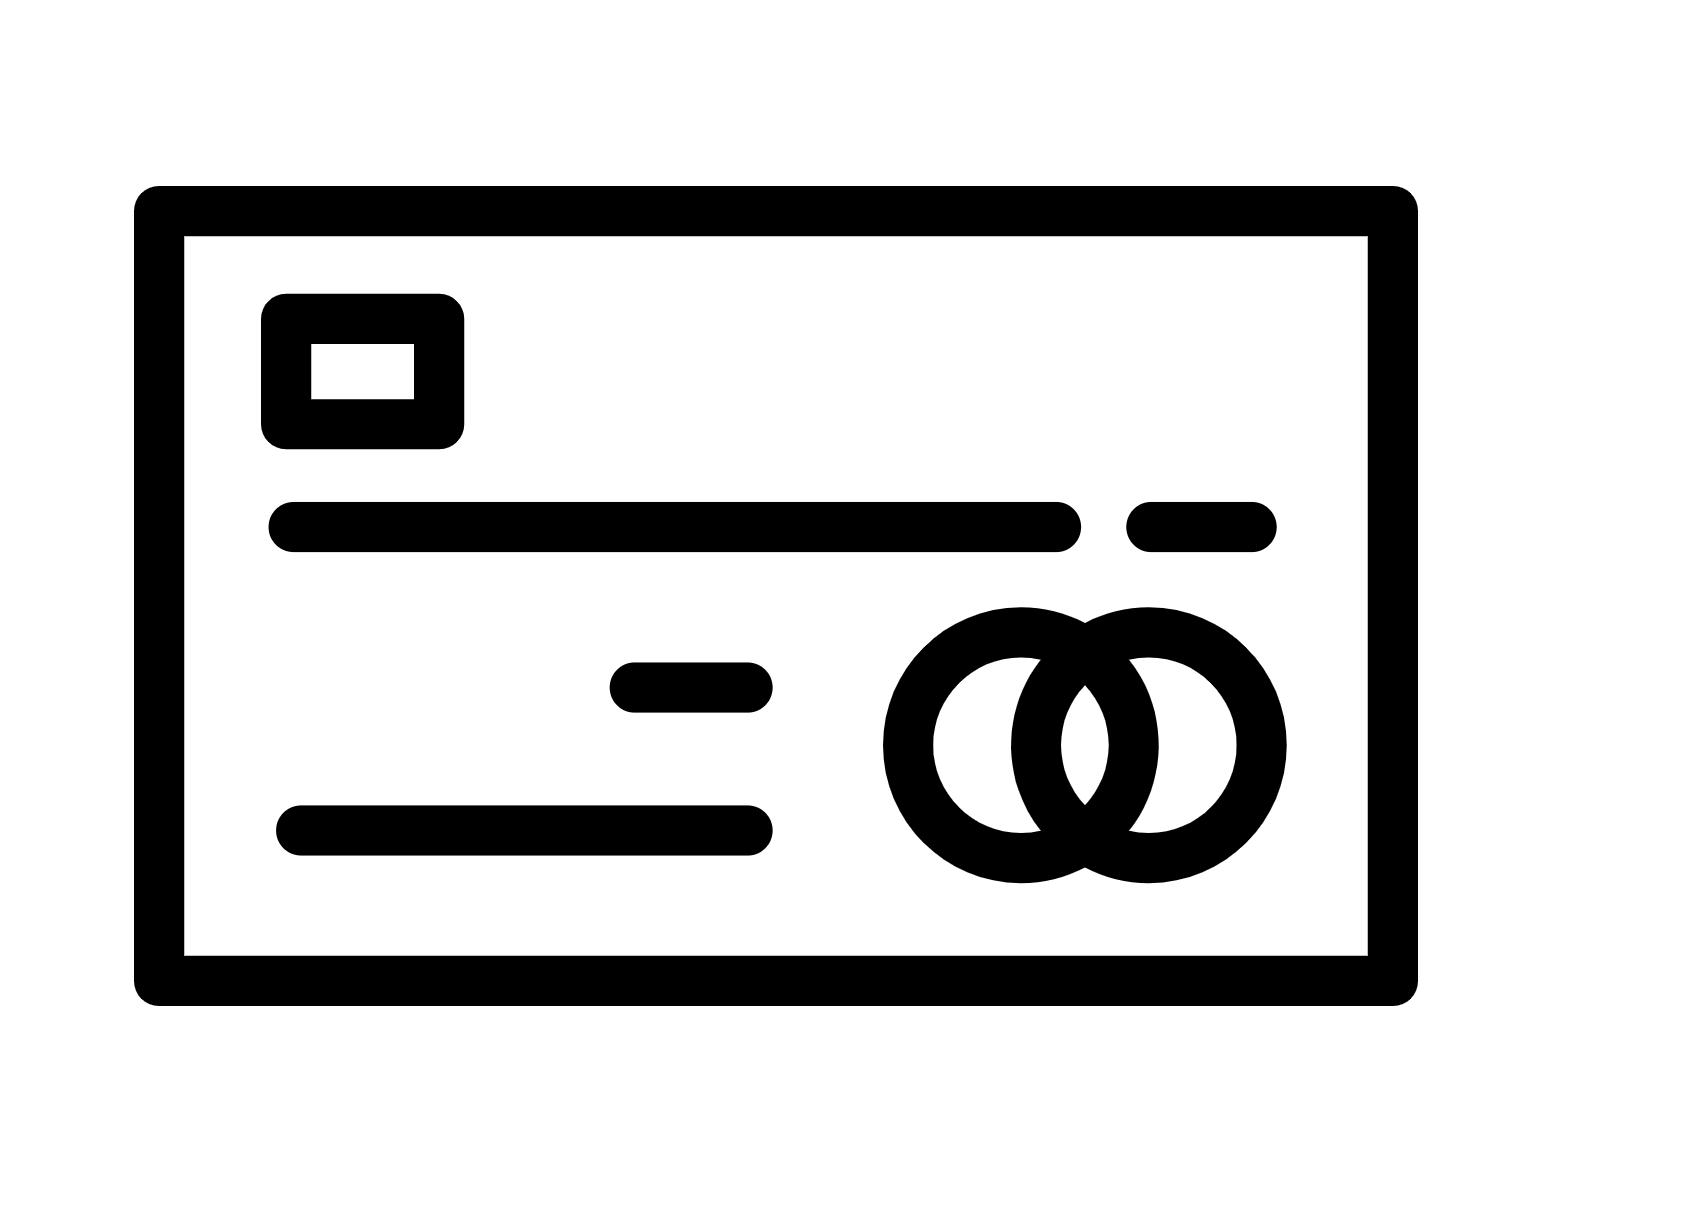 www.turboprepaidcard.com/activate